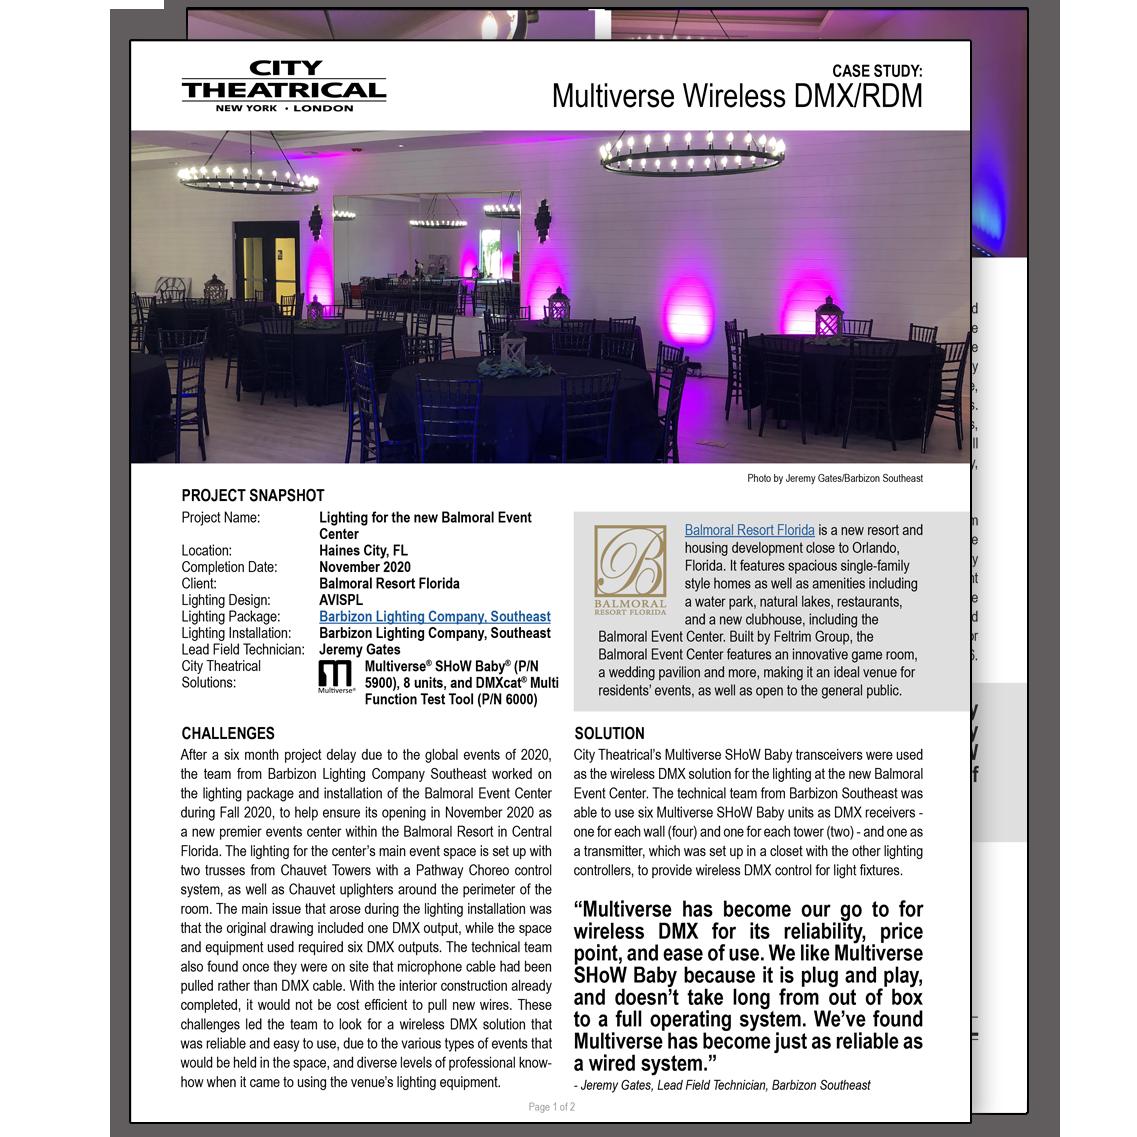 Multiverse SHoW Baby at Balmoral Resort Florida case study